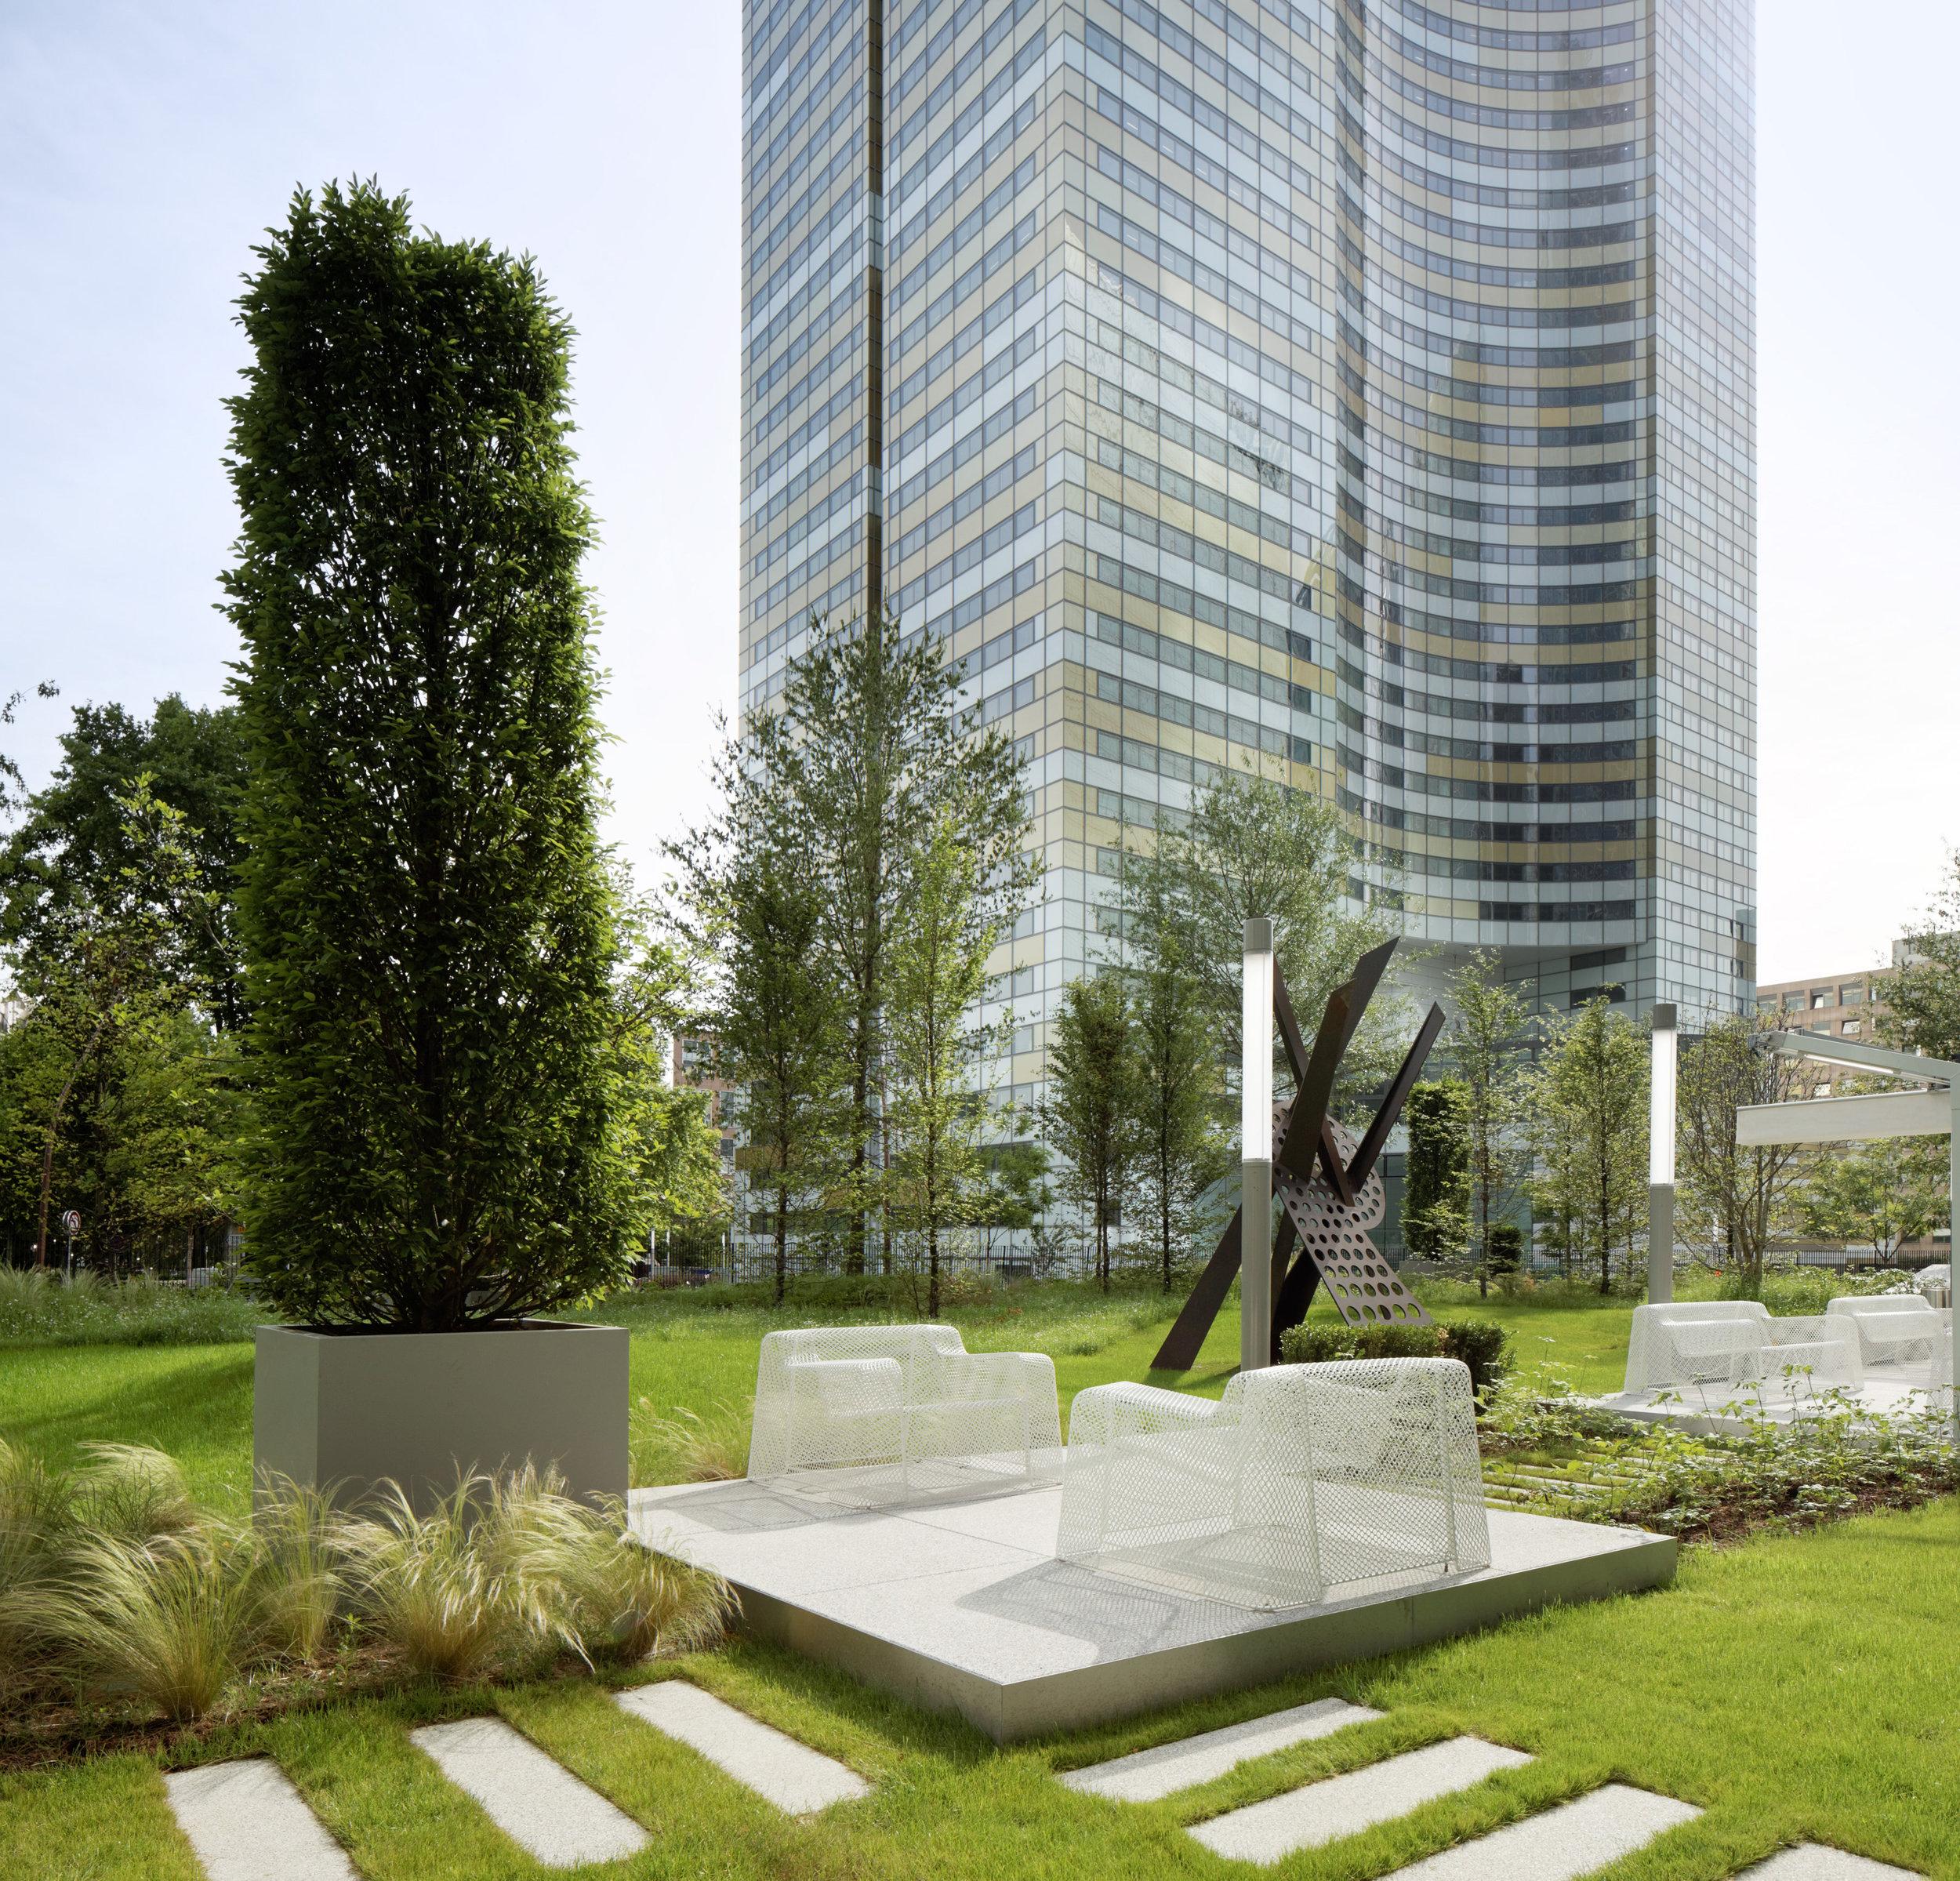 europlaza_tower_paris_la_defense_terraces_gardens_christophe_gautrand_landscape_outdoor_designer_9.jpg